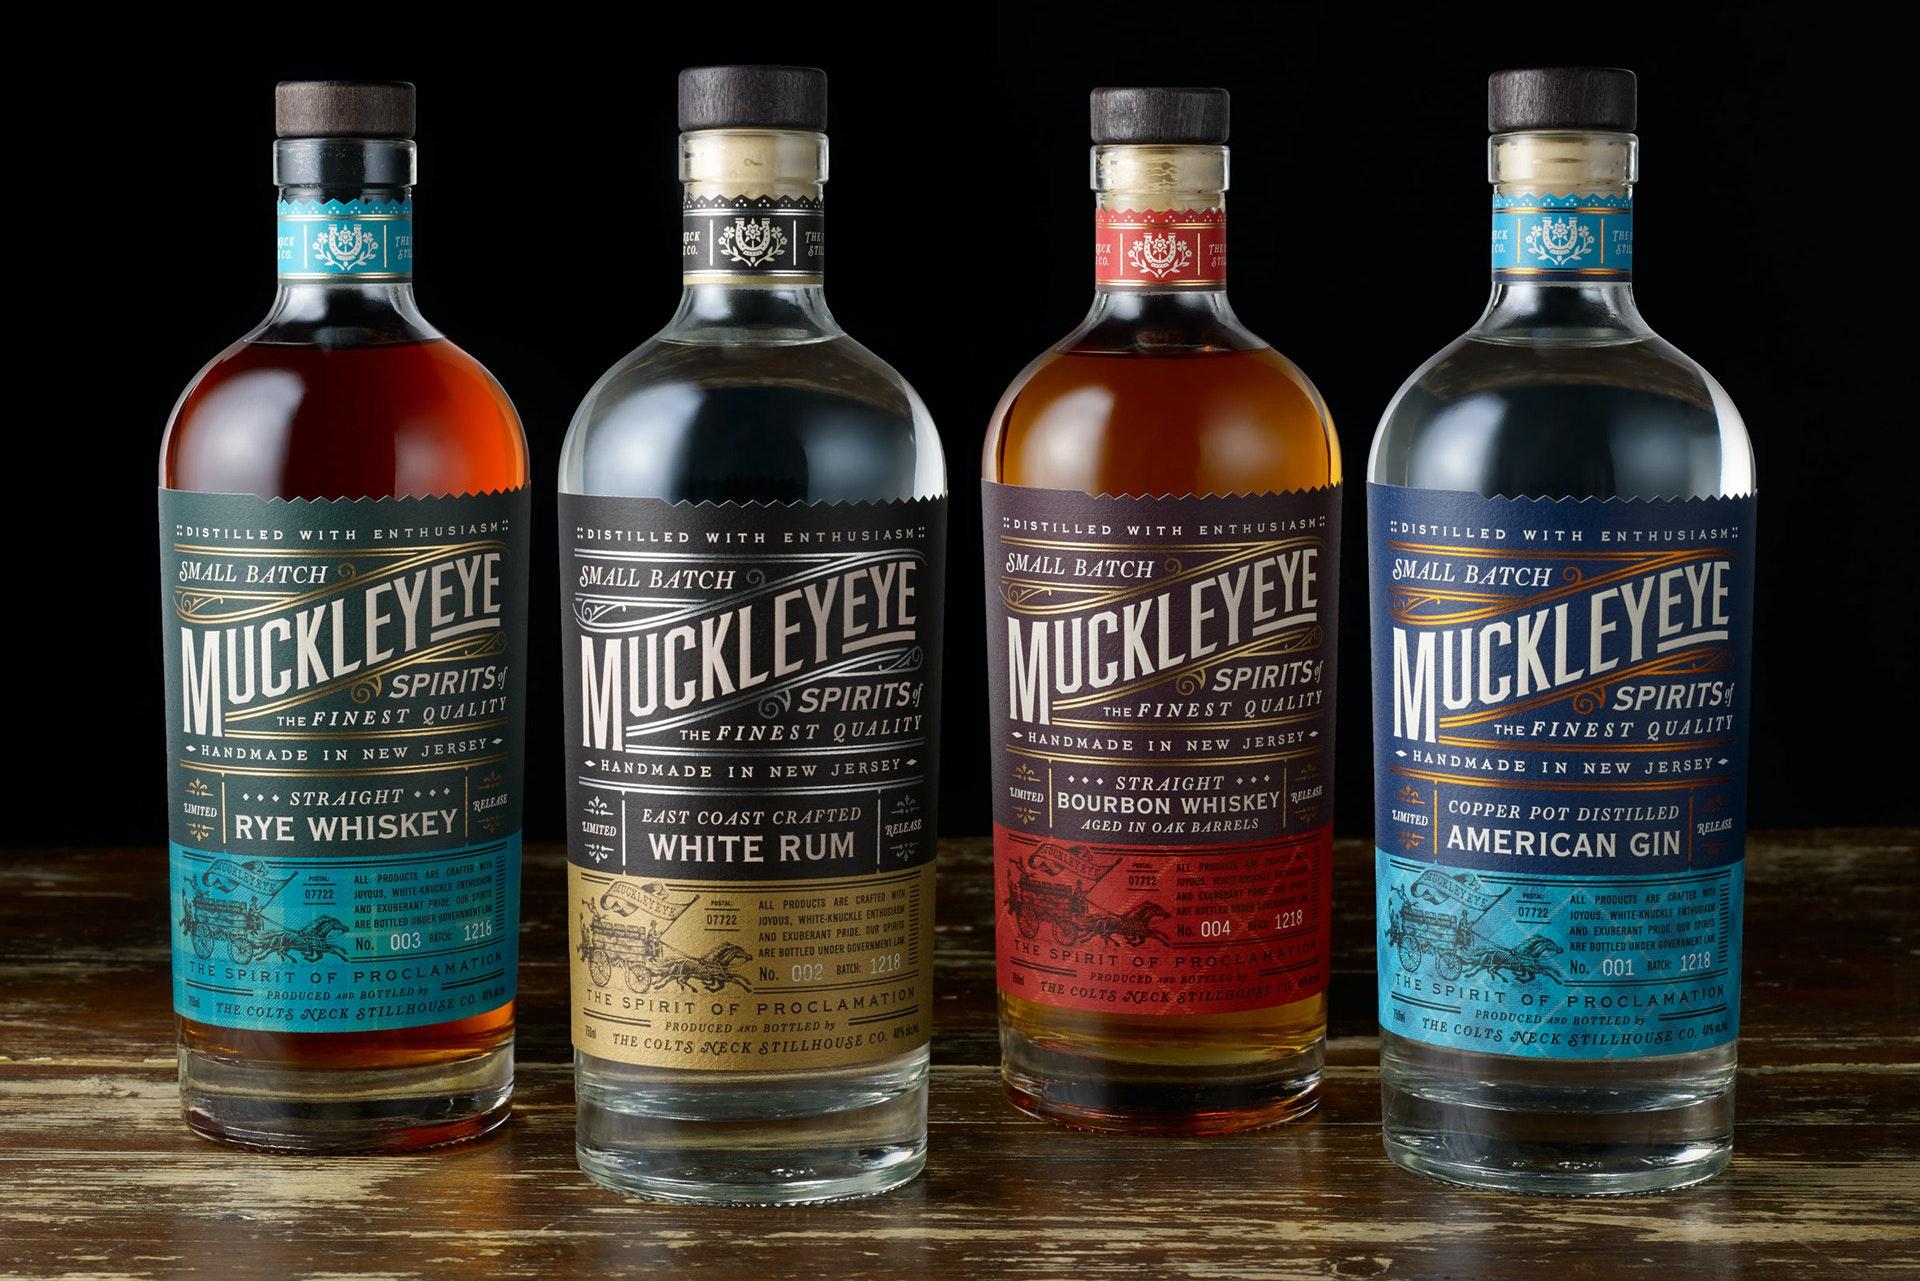 Muckleye vintage liquor design